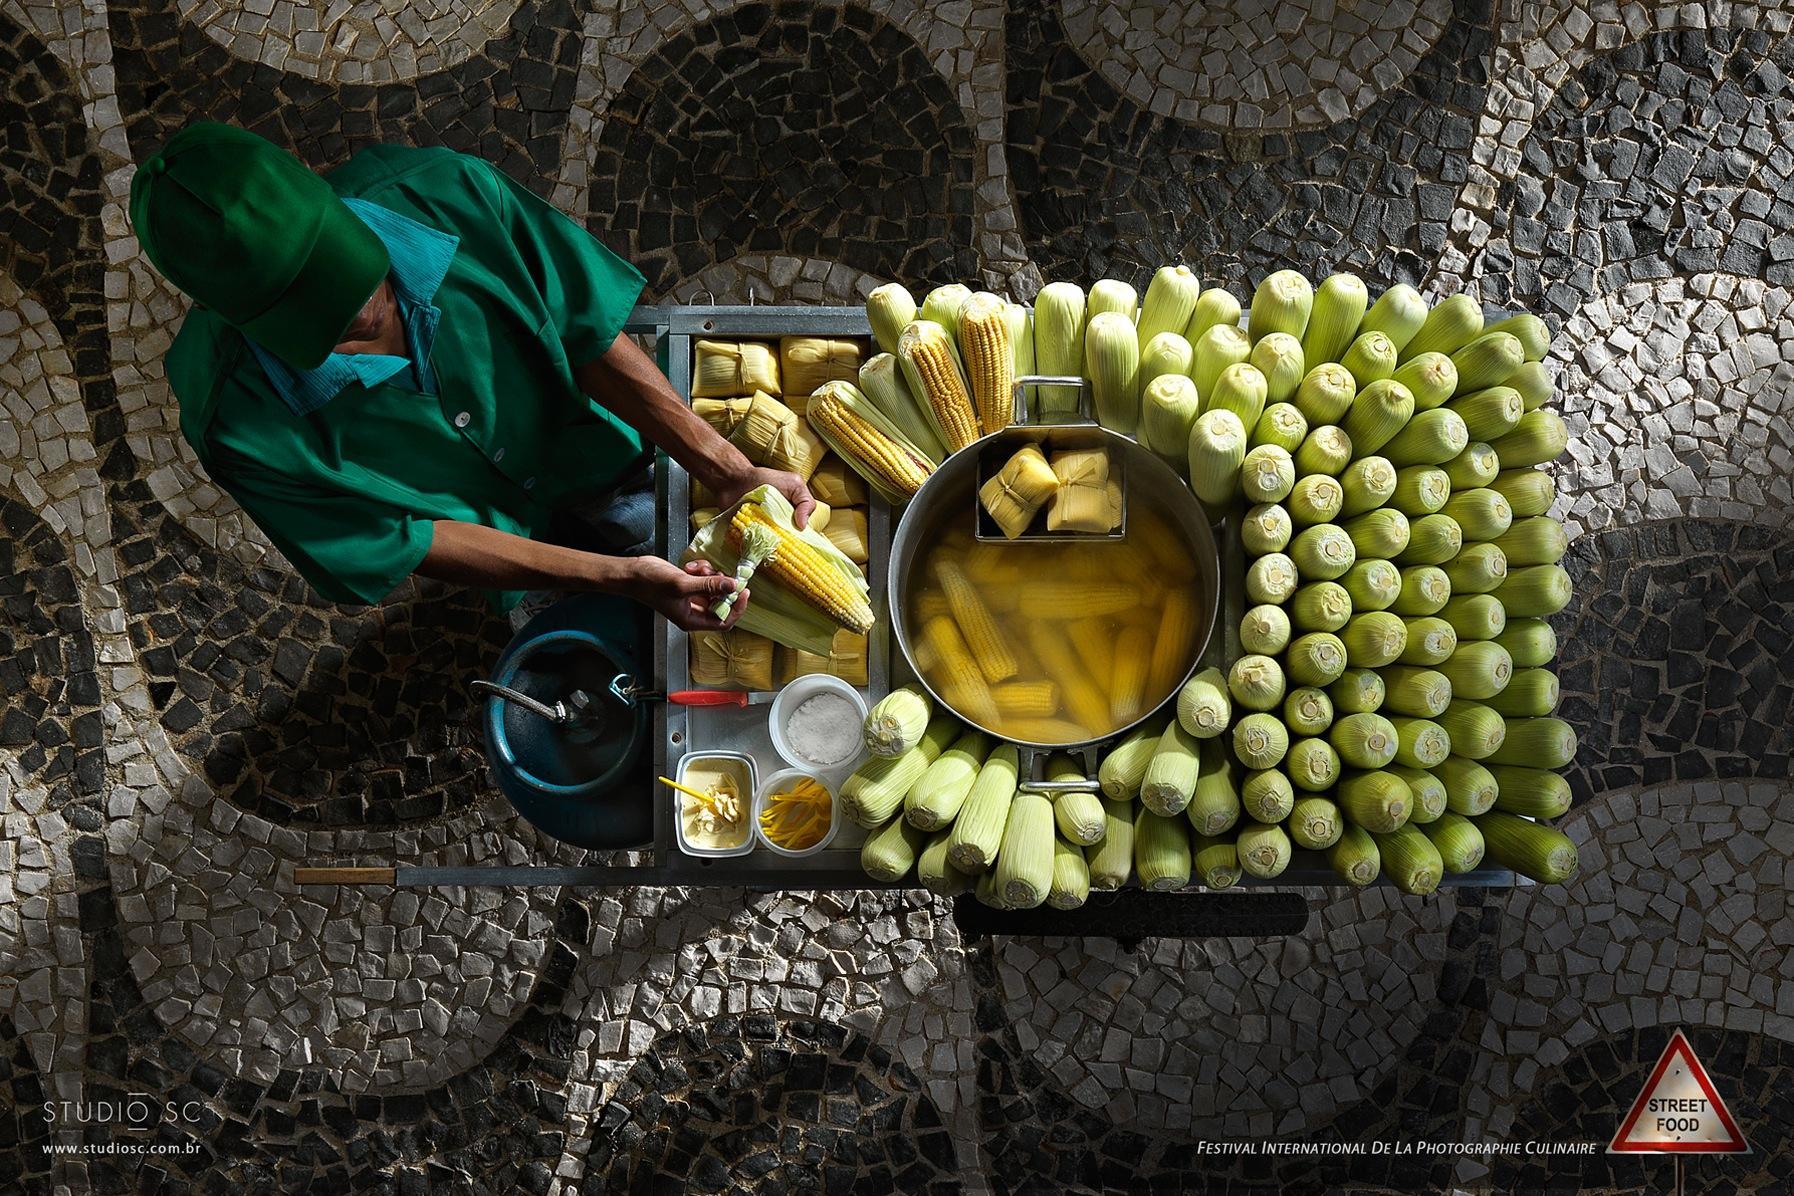 Festival International de la Photographie Culinaire Print Ad -  Street Food, 2